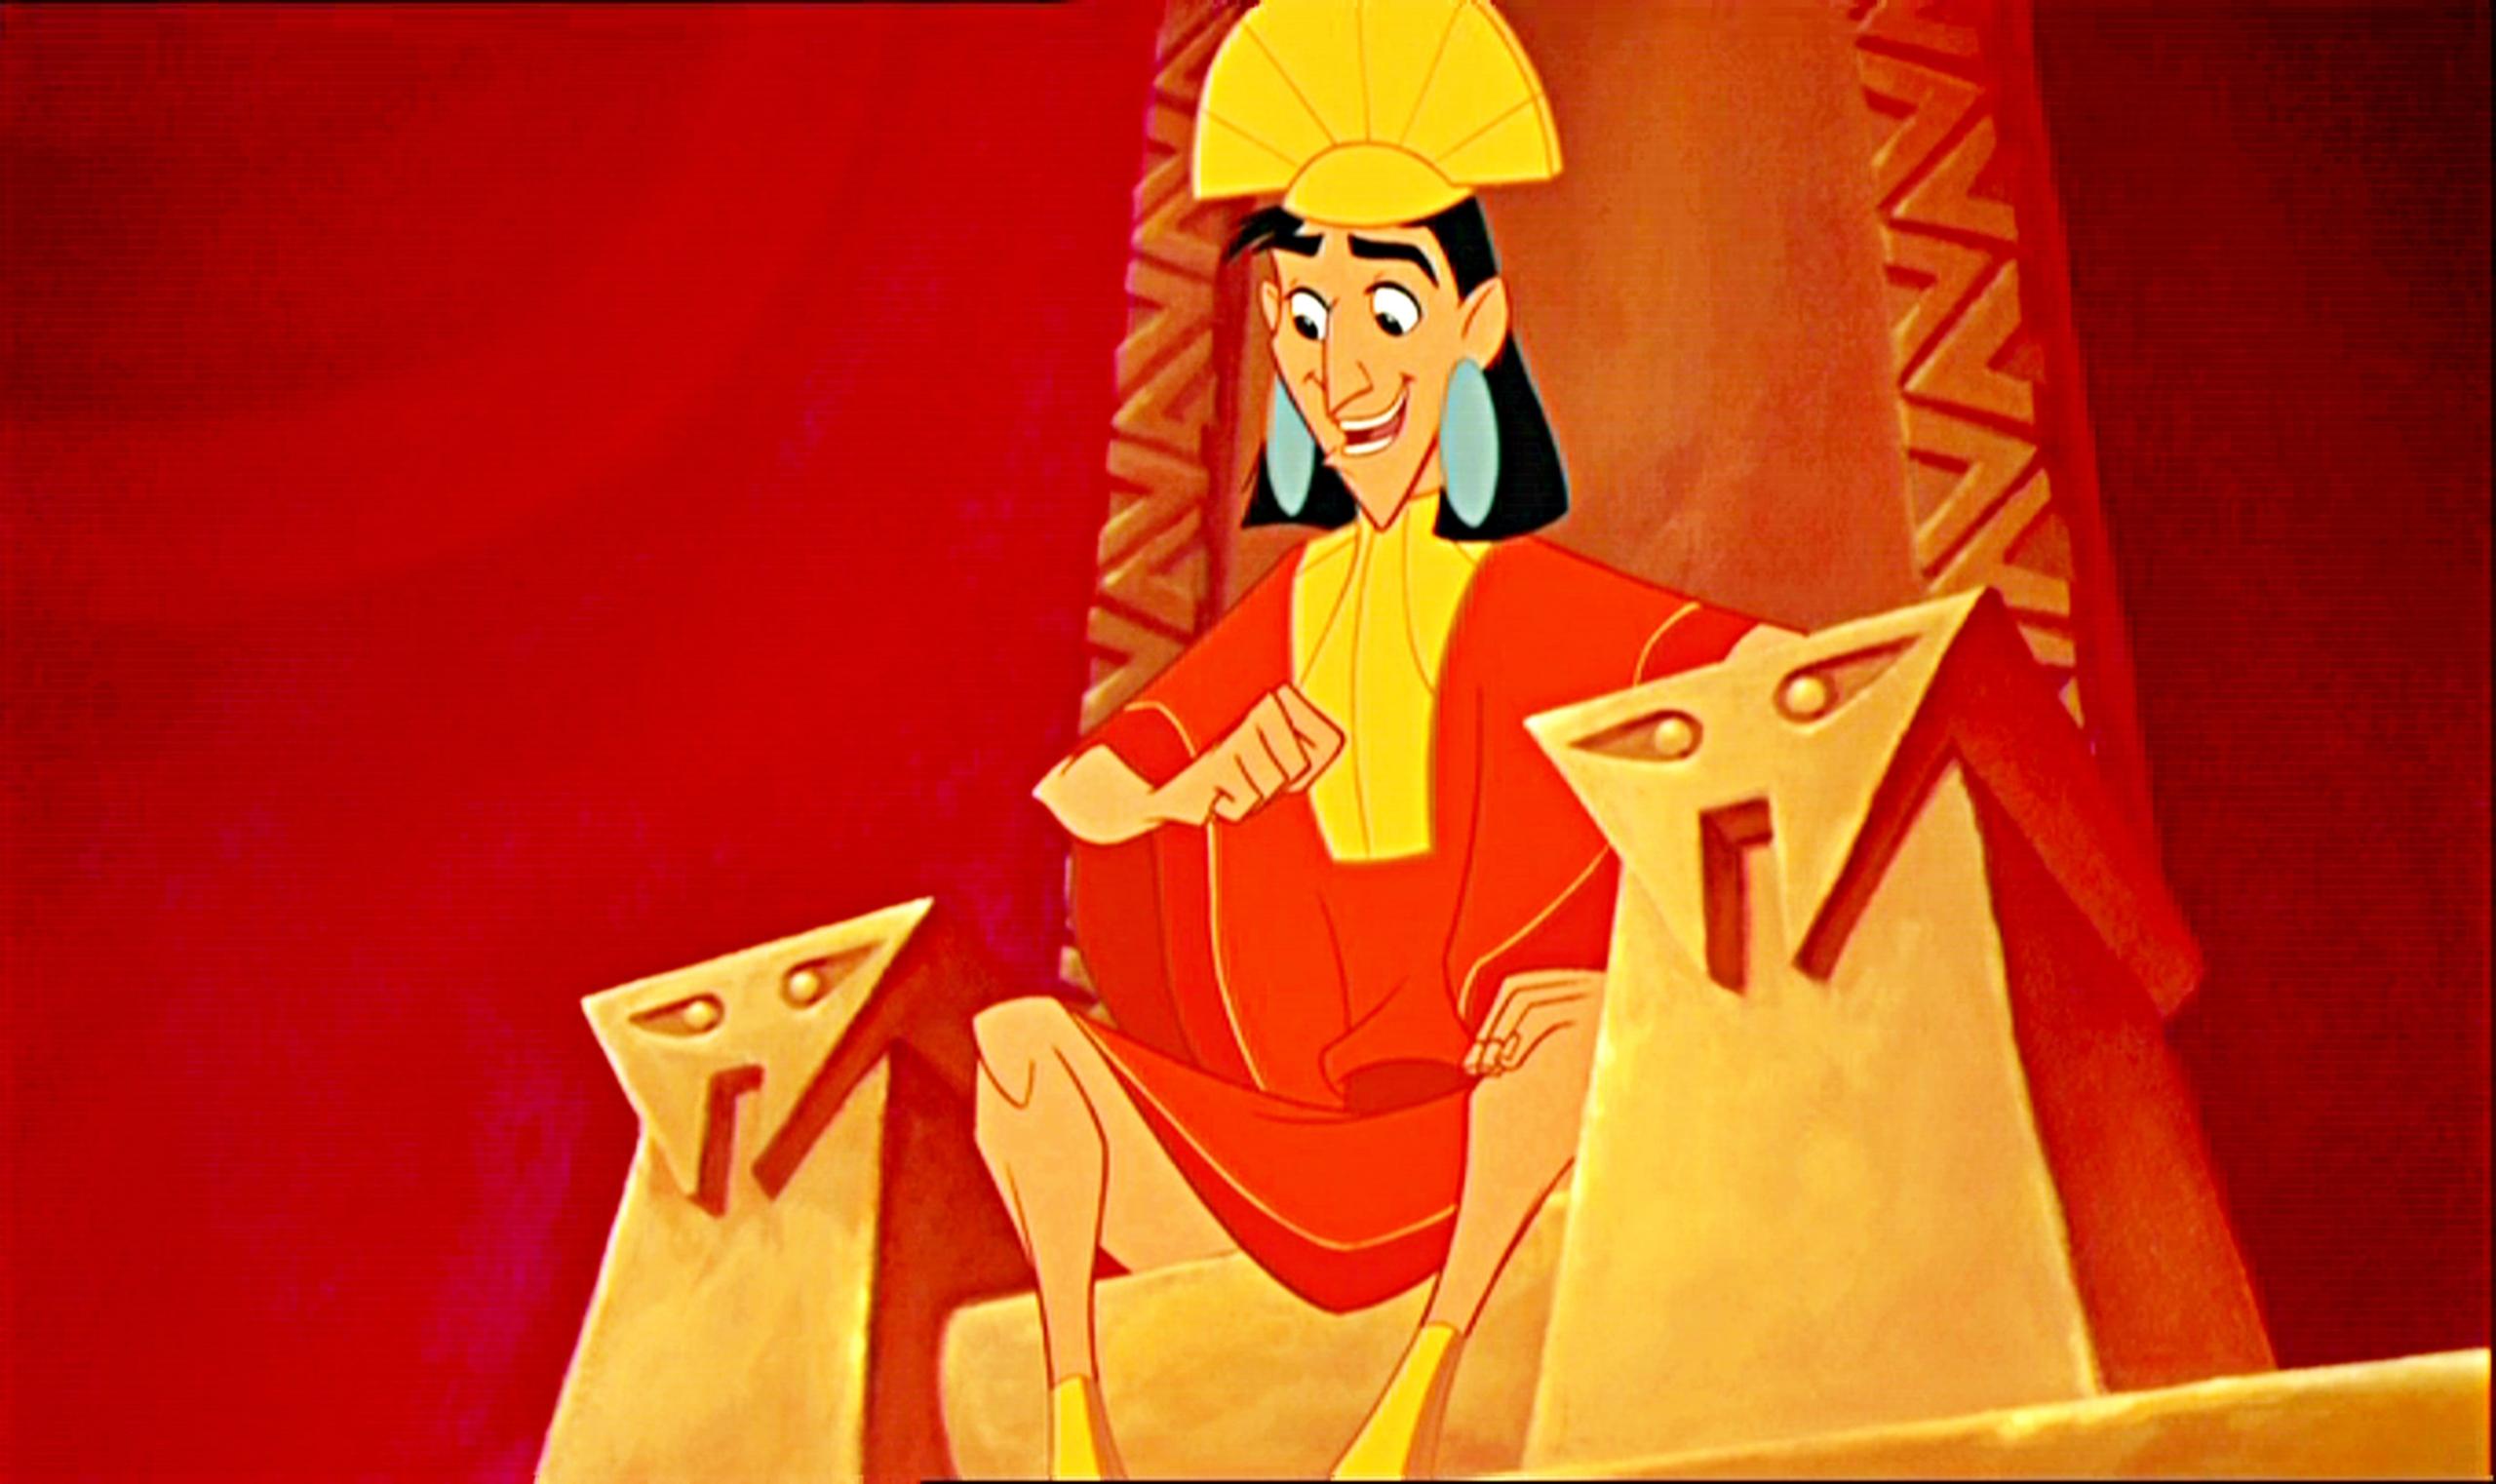 http://images5.fanpop.com/image/photos/29600000/Walt-Disney-Screencaps-Emperor-Kuzco-walt-disney-characters-29625847-2560-1522.jpg